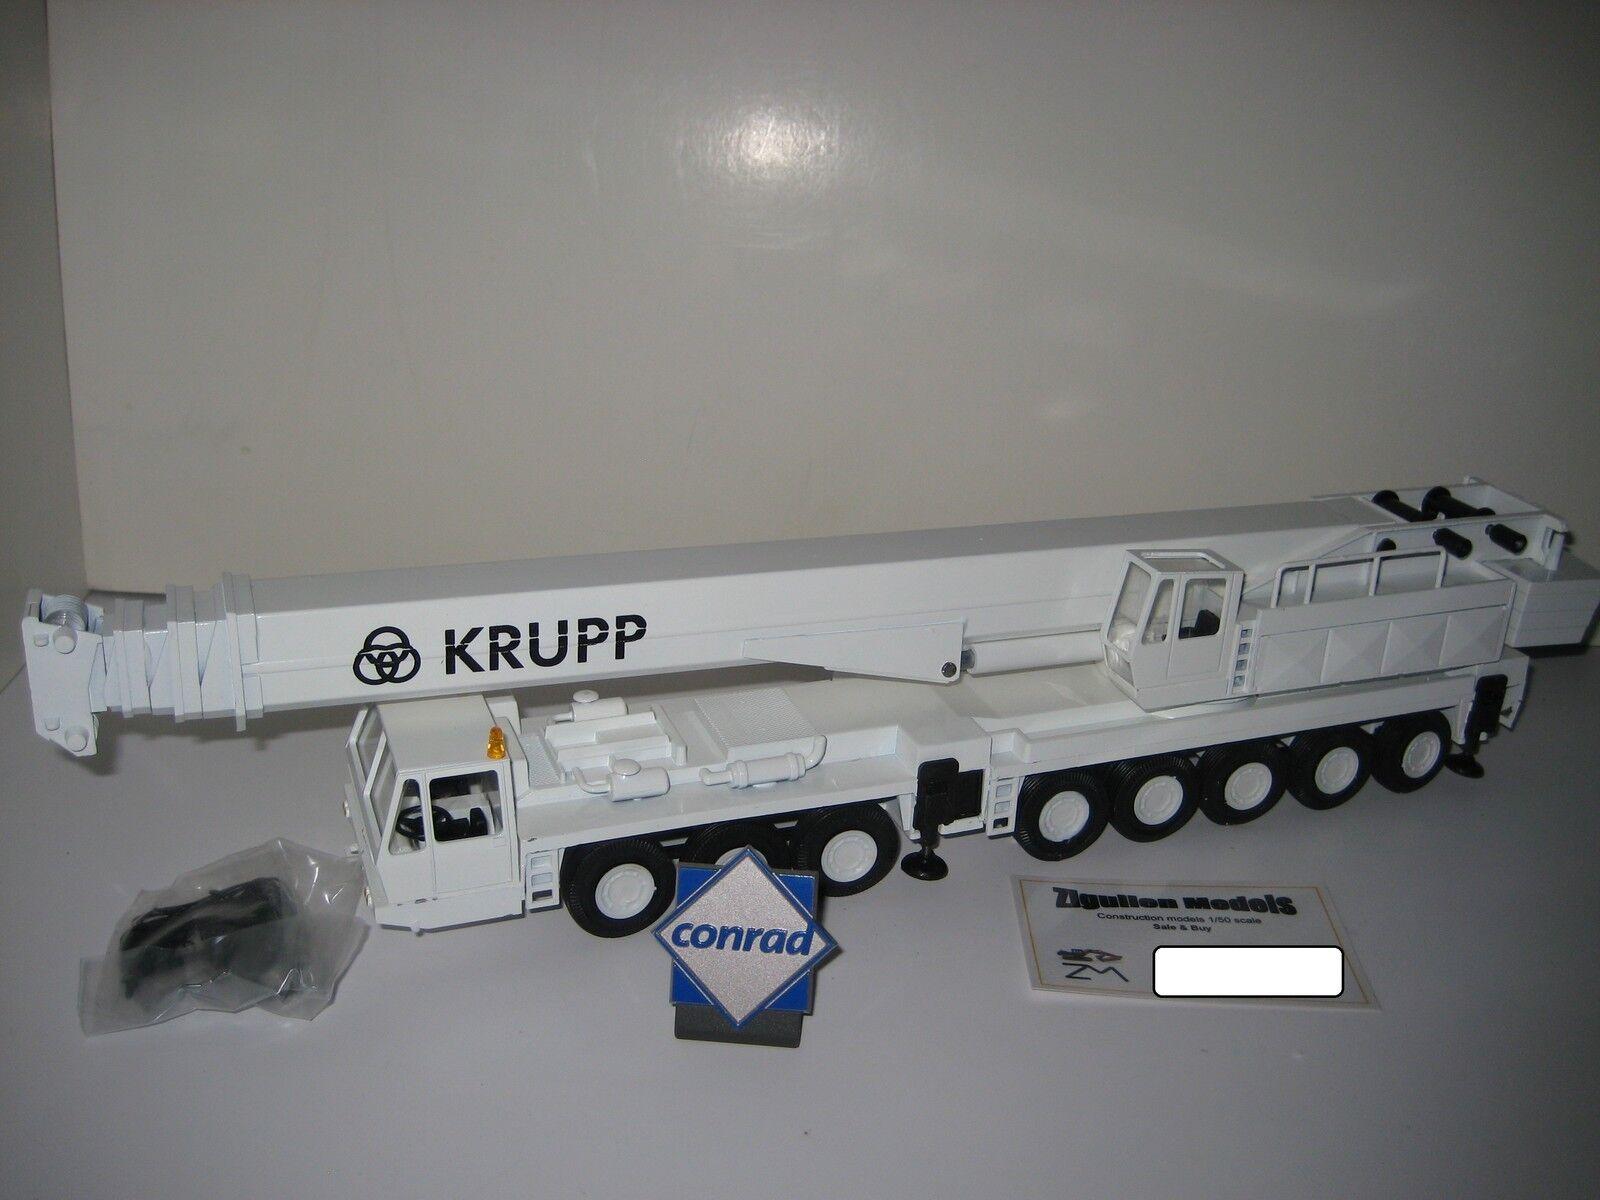 mejor precio KRUPP KMK 8350 GRÚA GRÚA GRÚA blancoA  2077.5 CONRADO 1 50  punto de venta barato